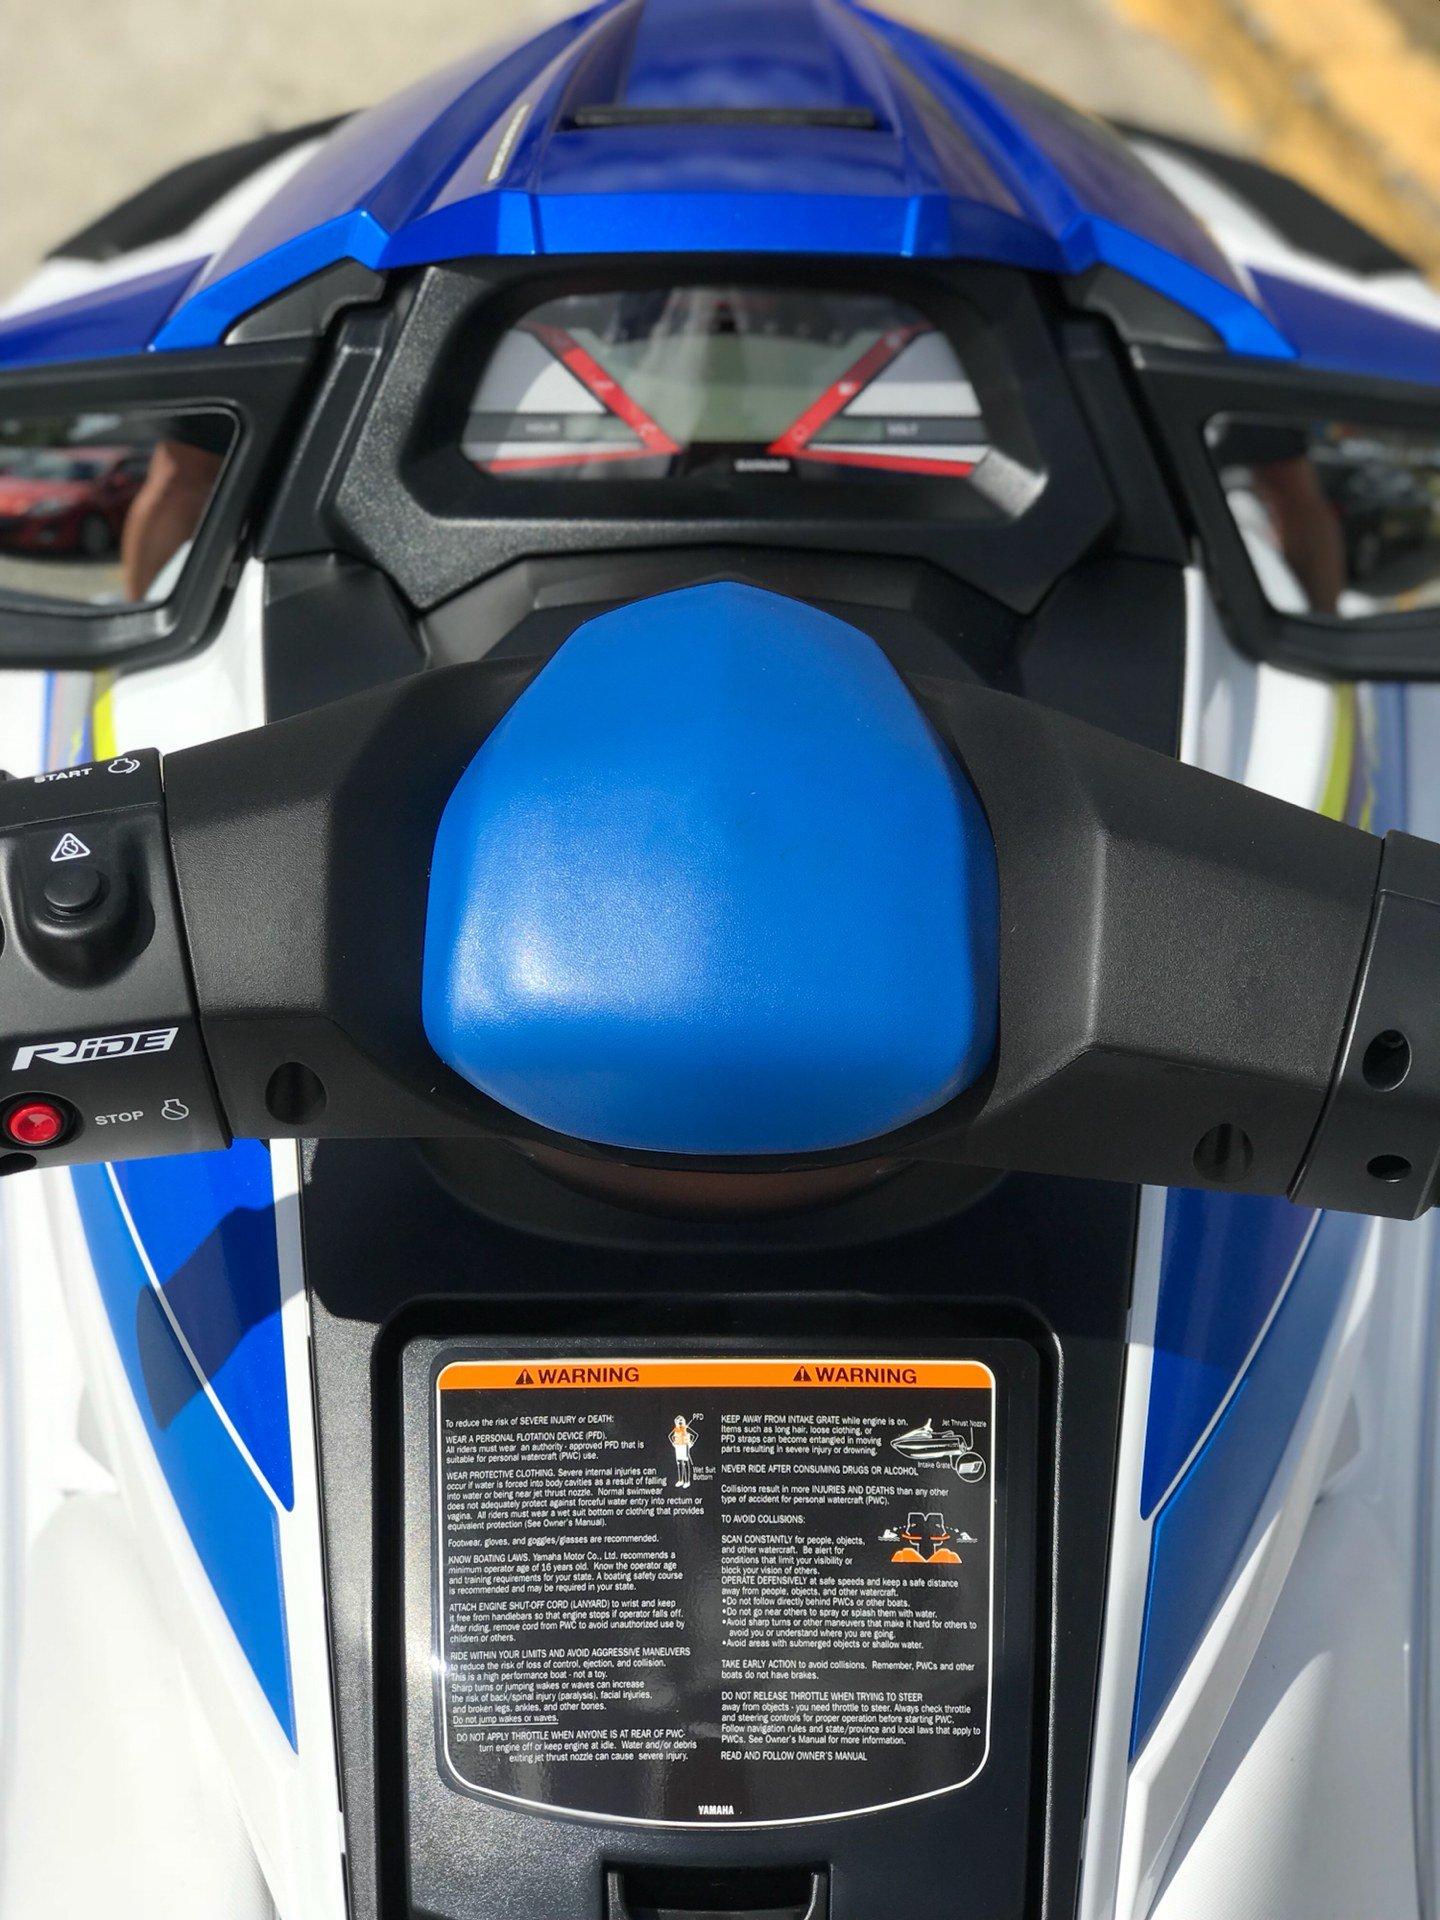 2019 Yamaha VXR in Orlando, Florida